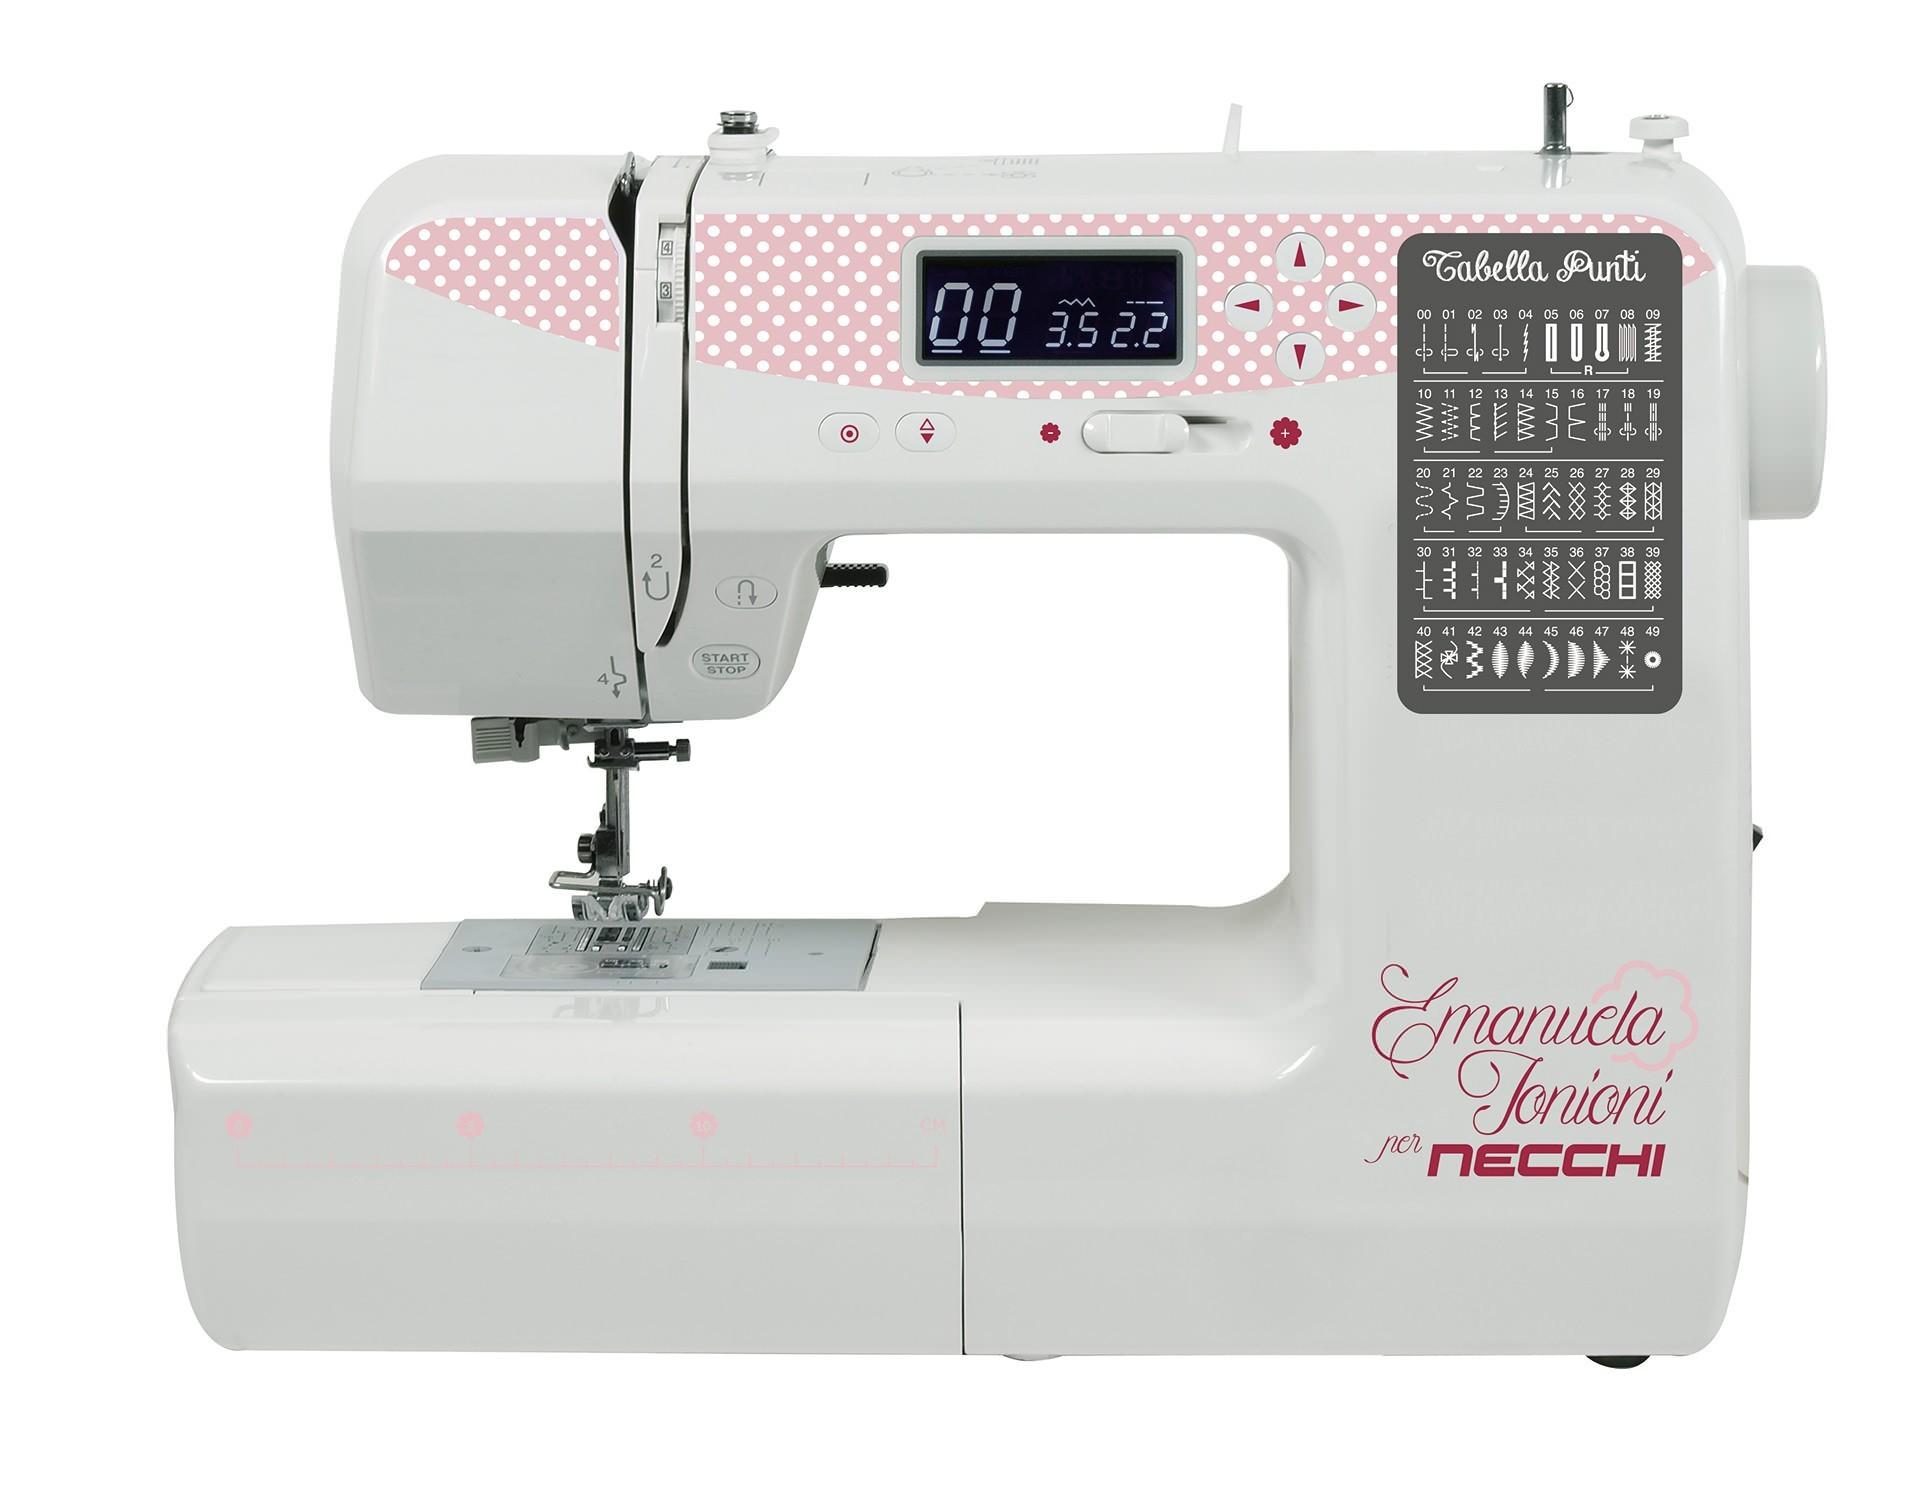 Macchina da cucire elettronica necchi n510 edizione zakka for Ipercoop macchina da cucire